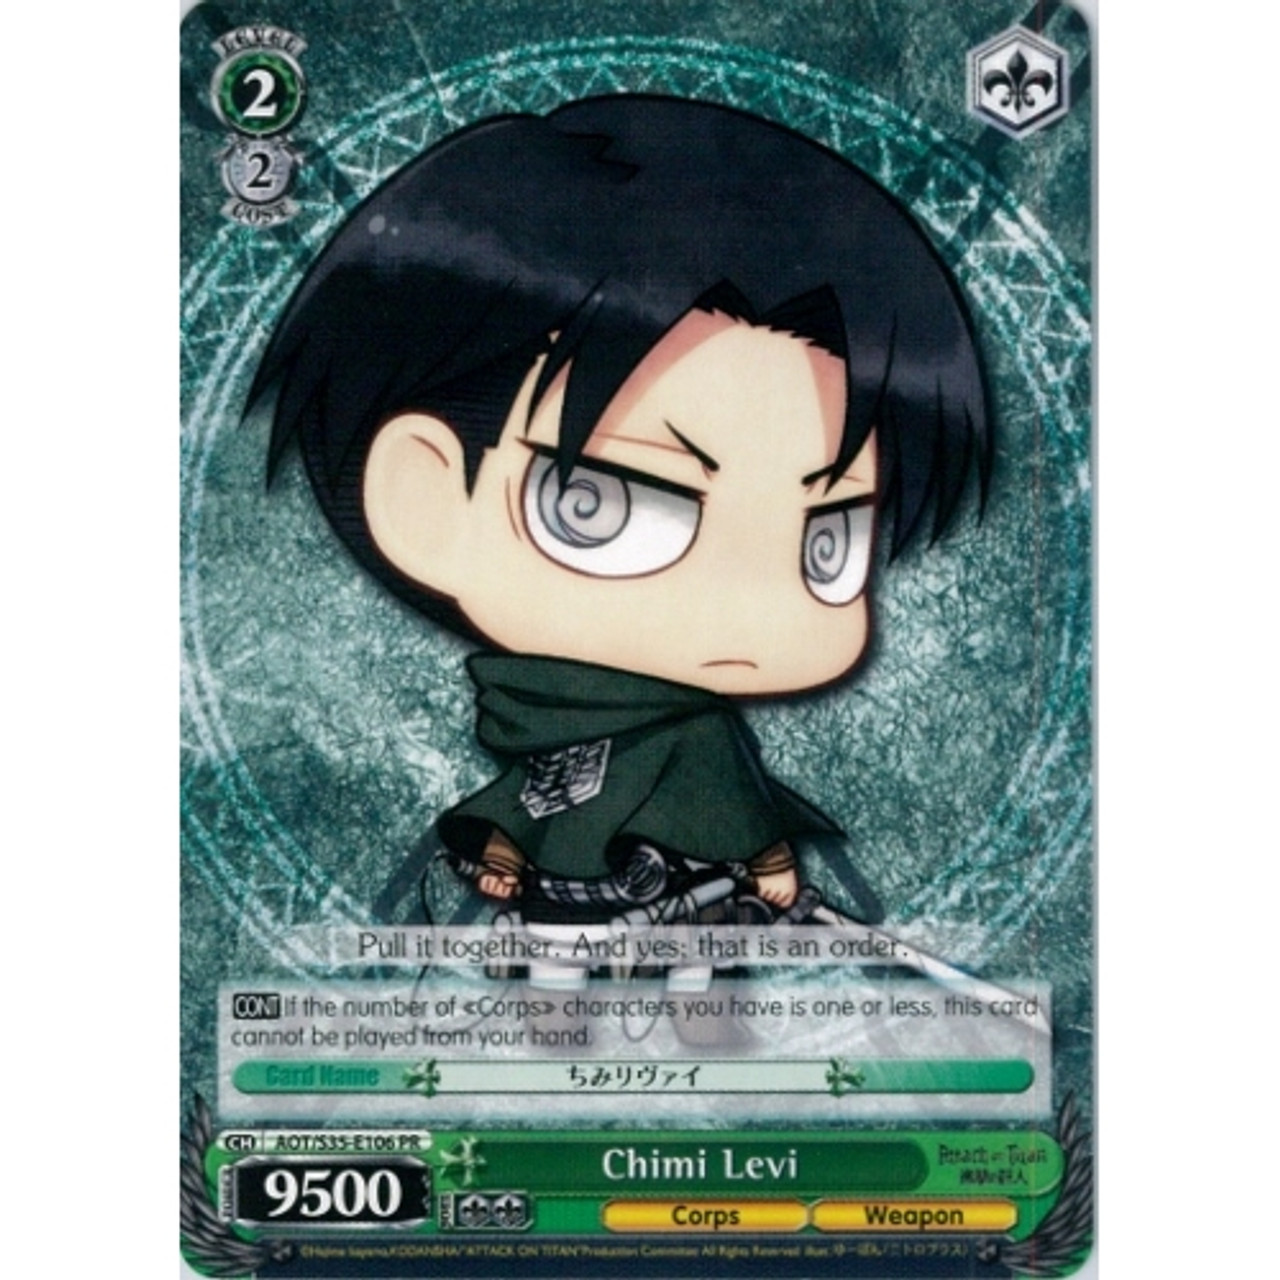 Chimi Armin promo attack on titan weiss schwarz